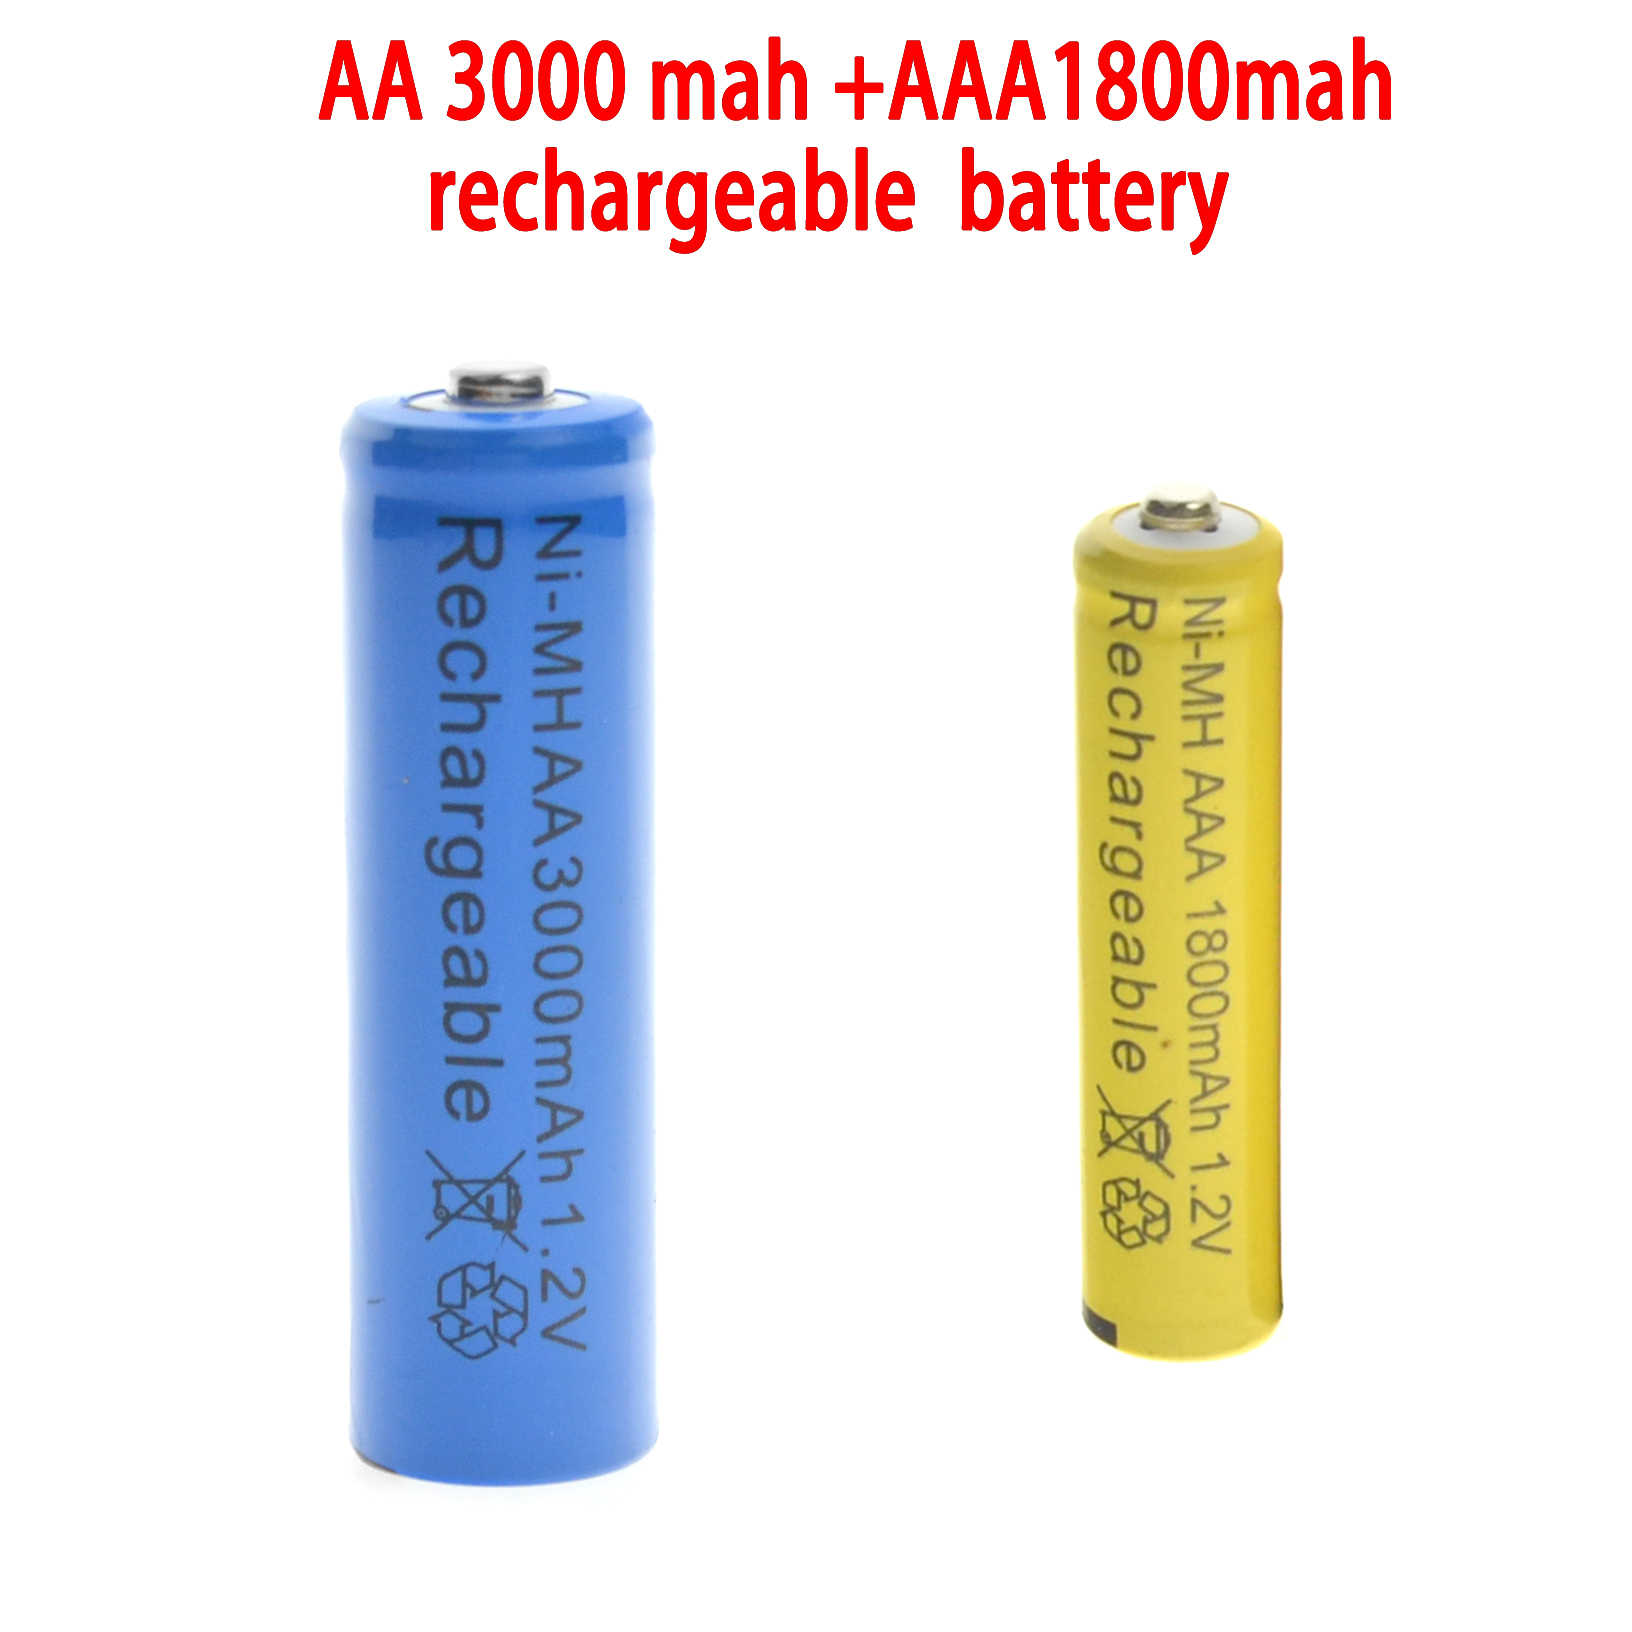 1-24 шт синий АА 3000 mAh + 1-24 шт желтый AAA 1800 mAh NiMH аккумуляторная батарея RC MP3 часы